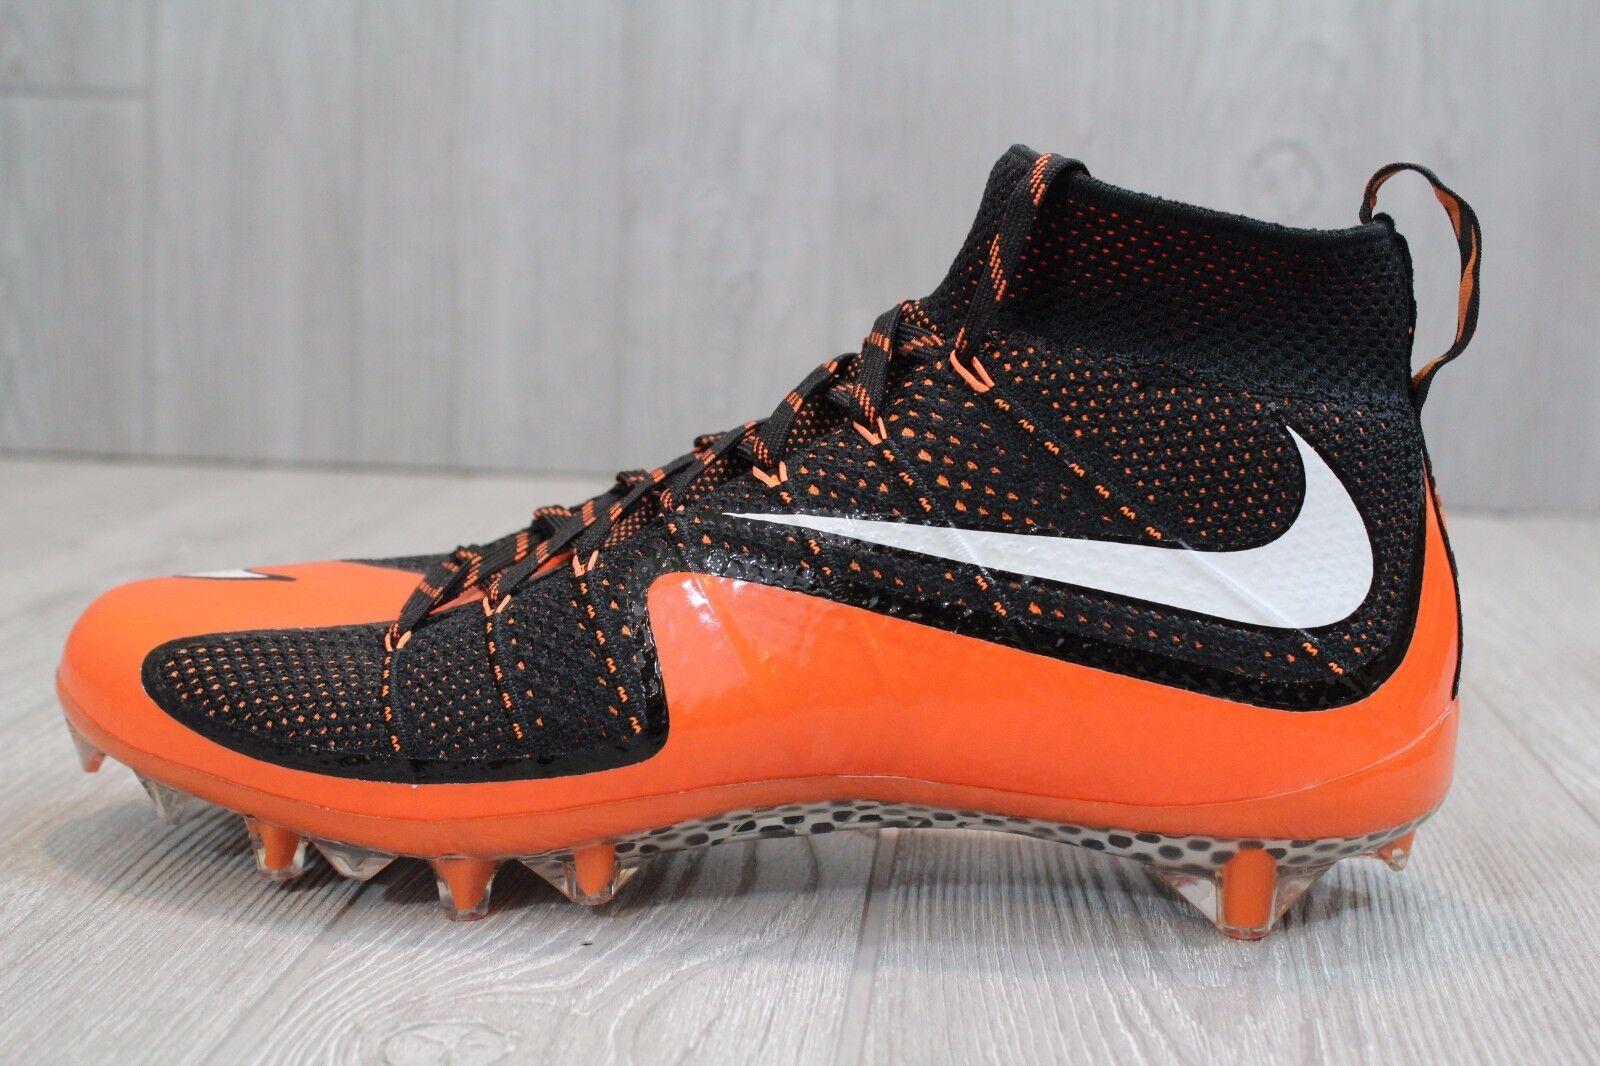 22 nuevos cleats Nike Vapor Flyknit Football cleats nuevos Negro 707455-0intocable Pro - 13 4ad7c3